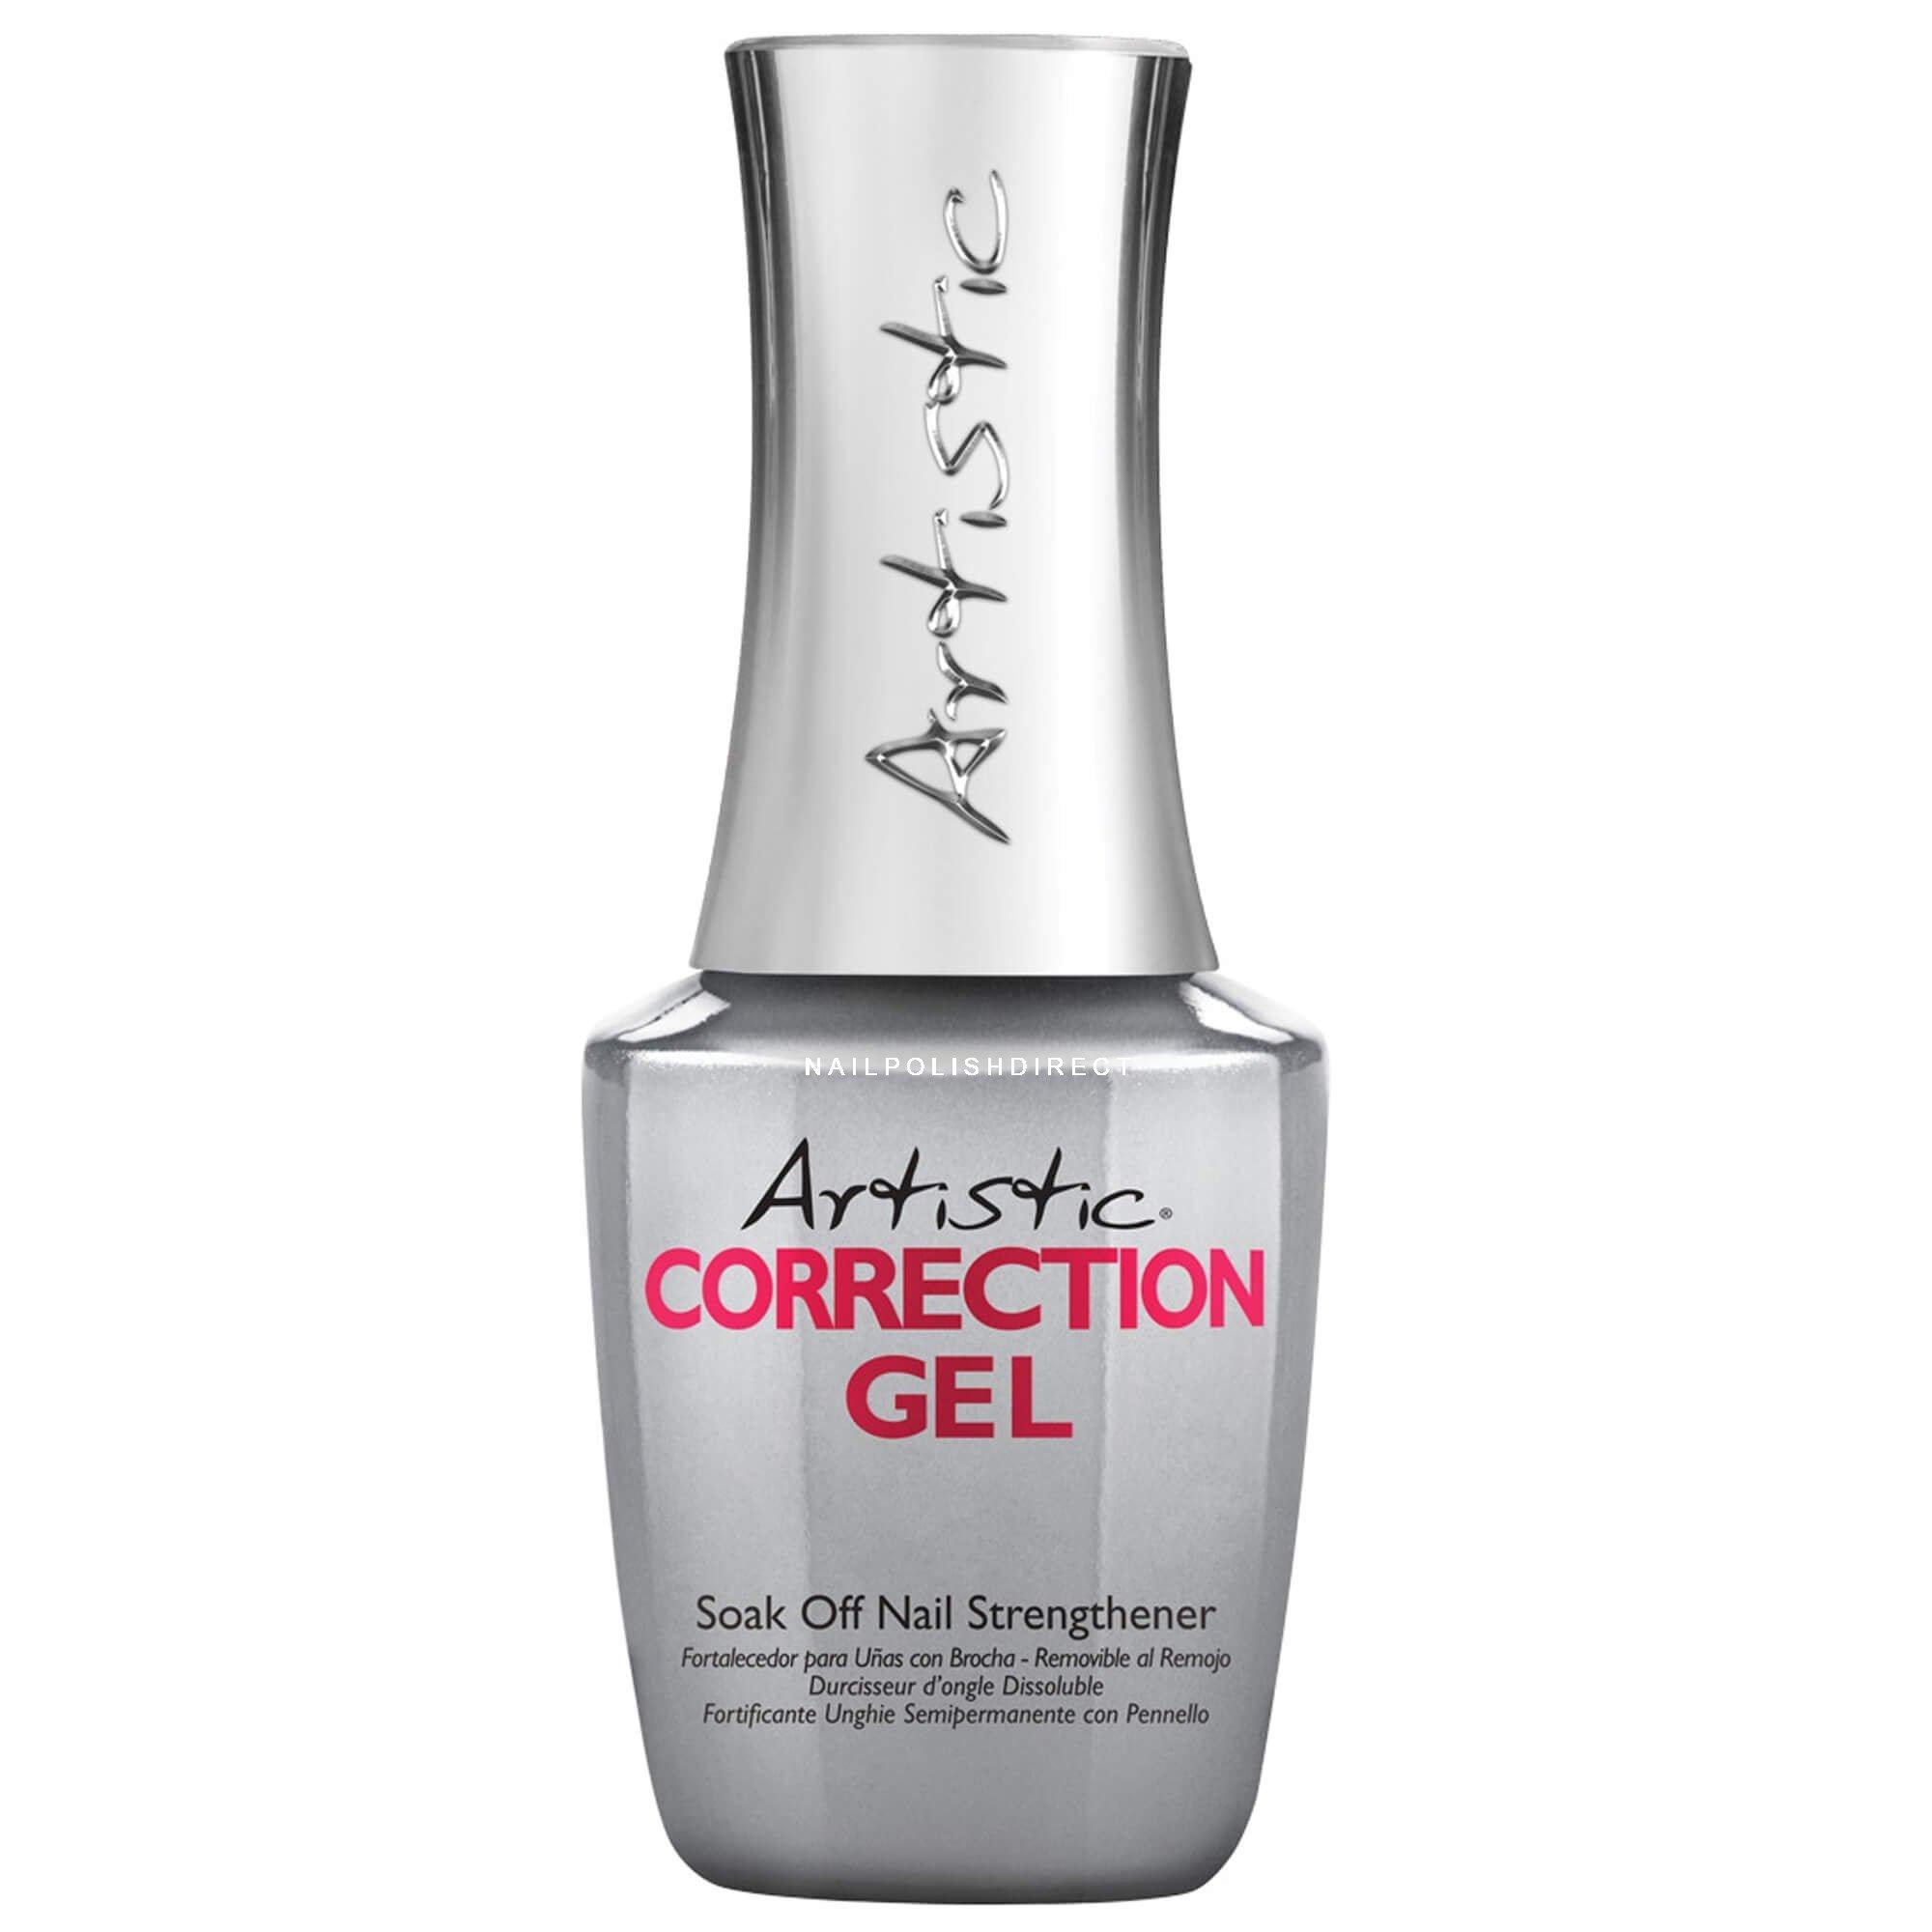 Brush On Nail Gel: Artistic Soak Off Brush-On Nail Strengthening Correction